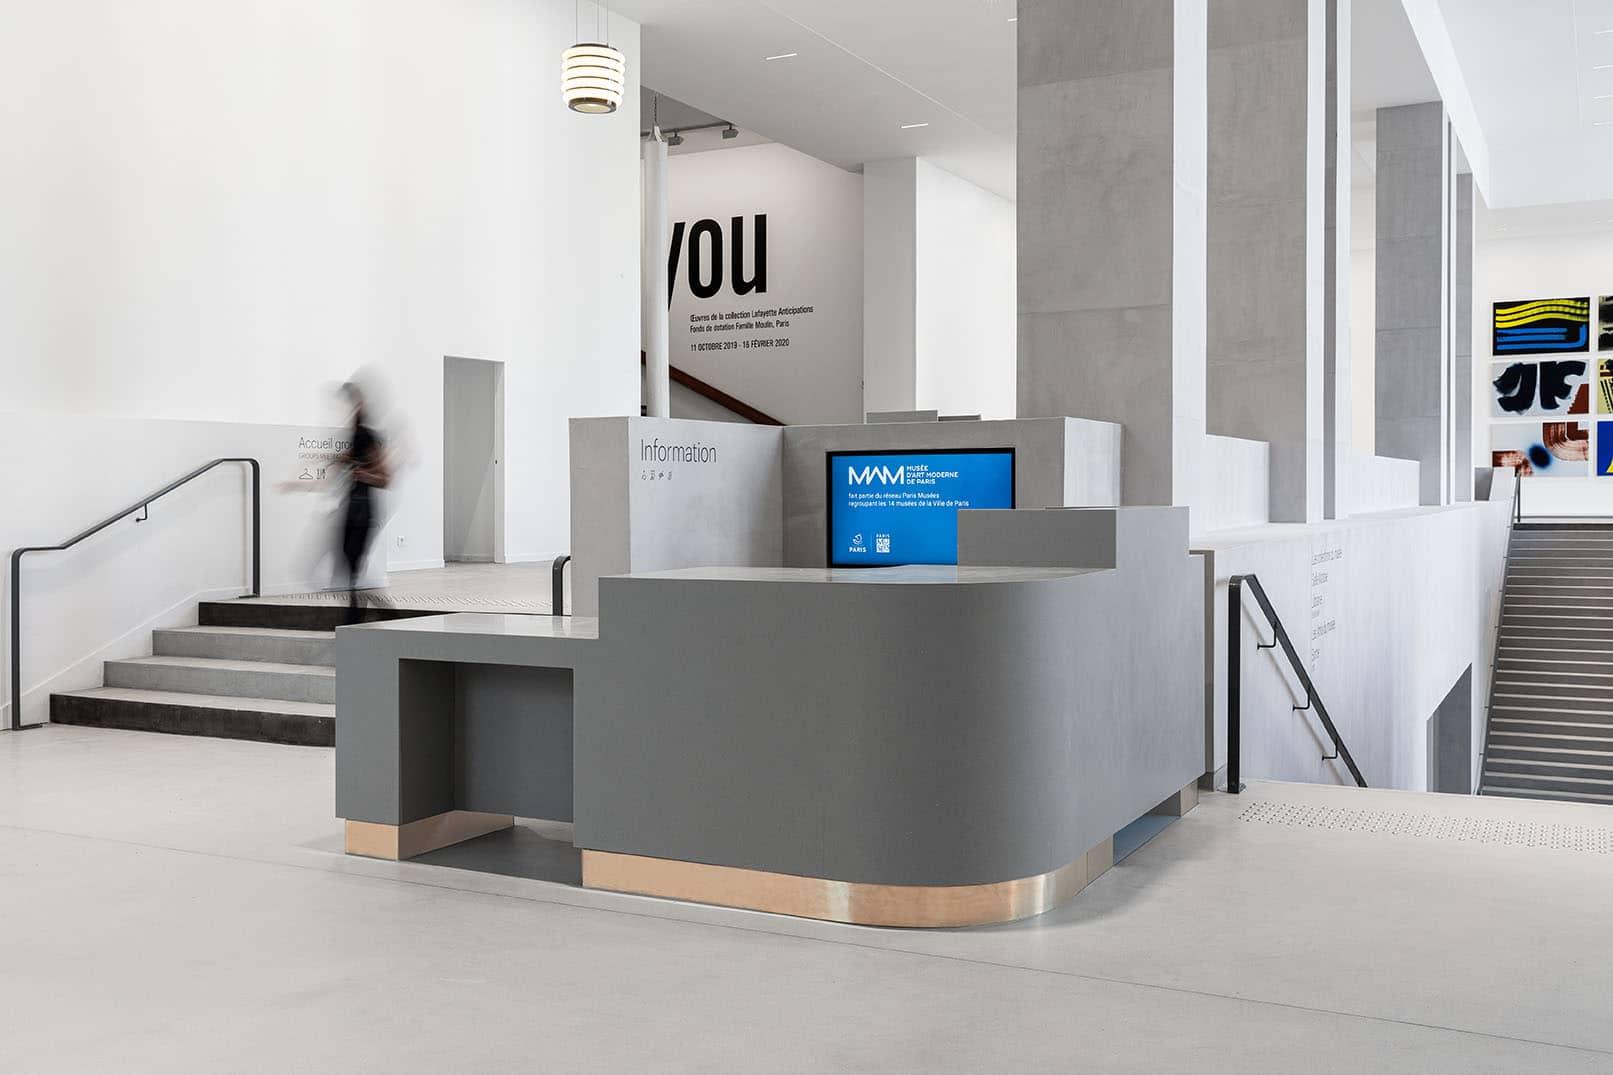 Musee Arts Modernes Paris Accueil